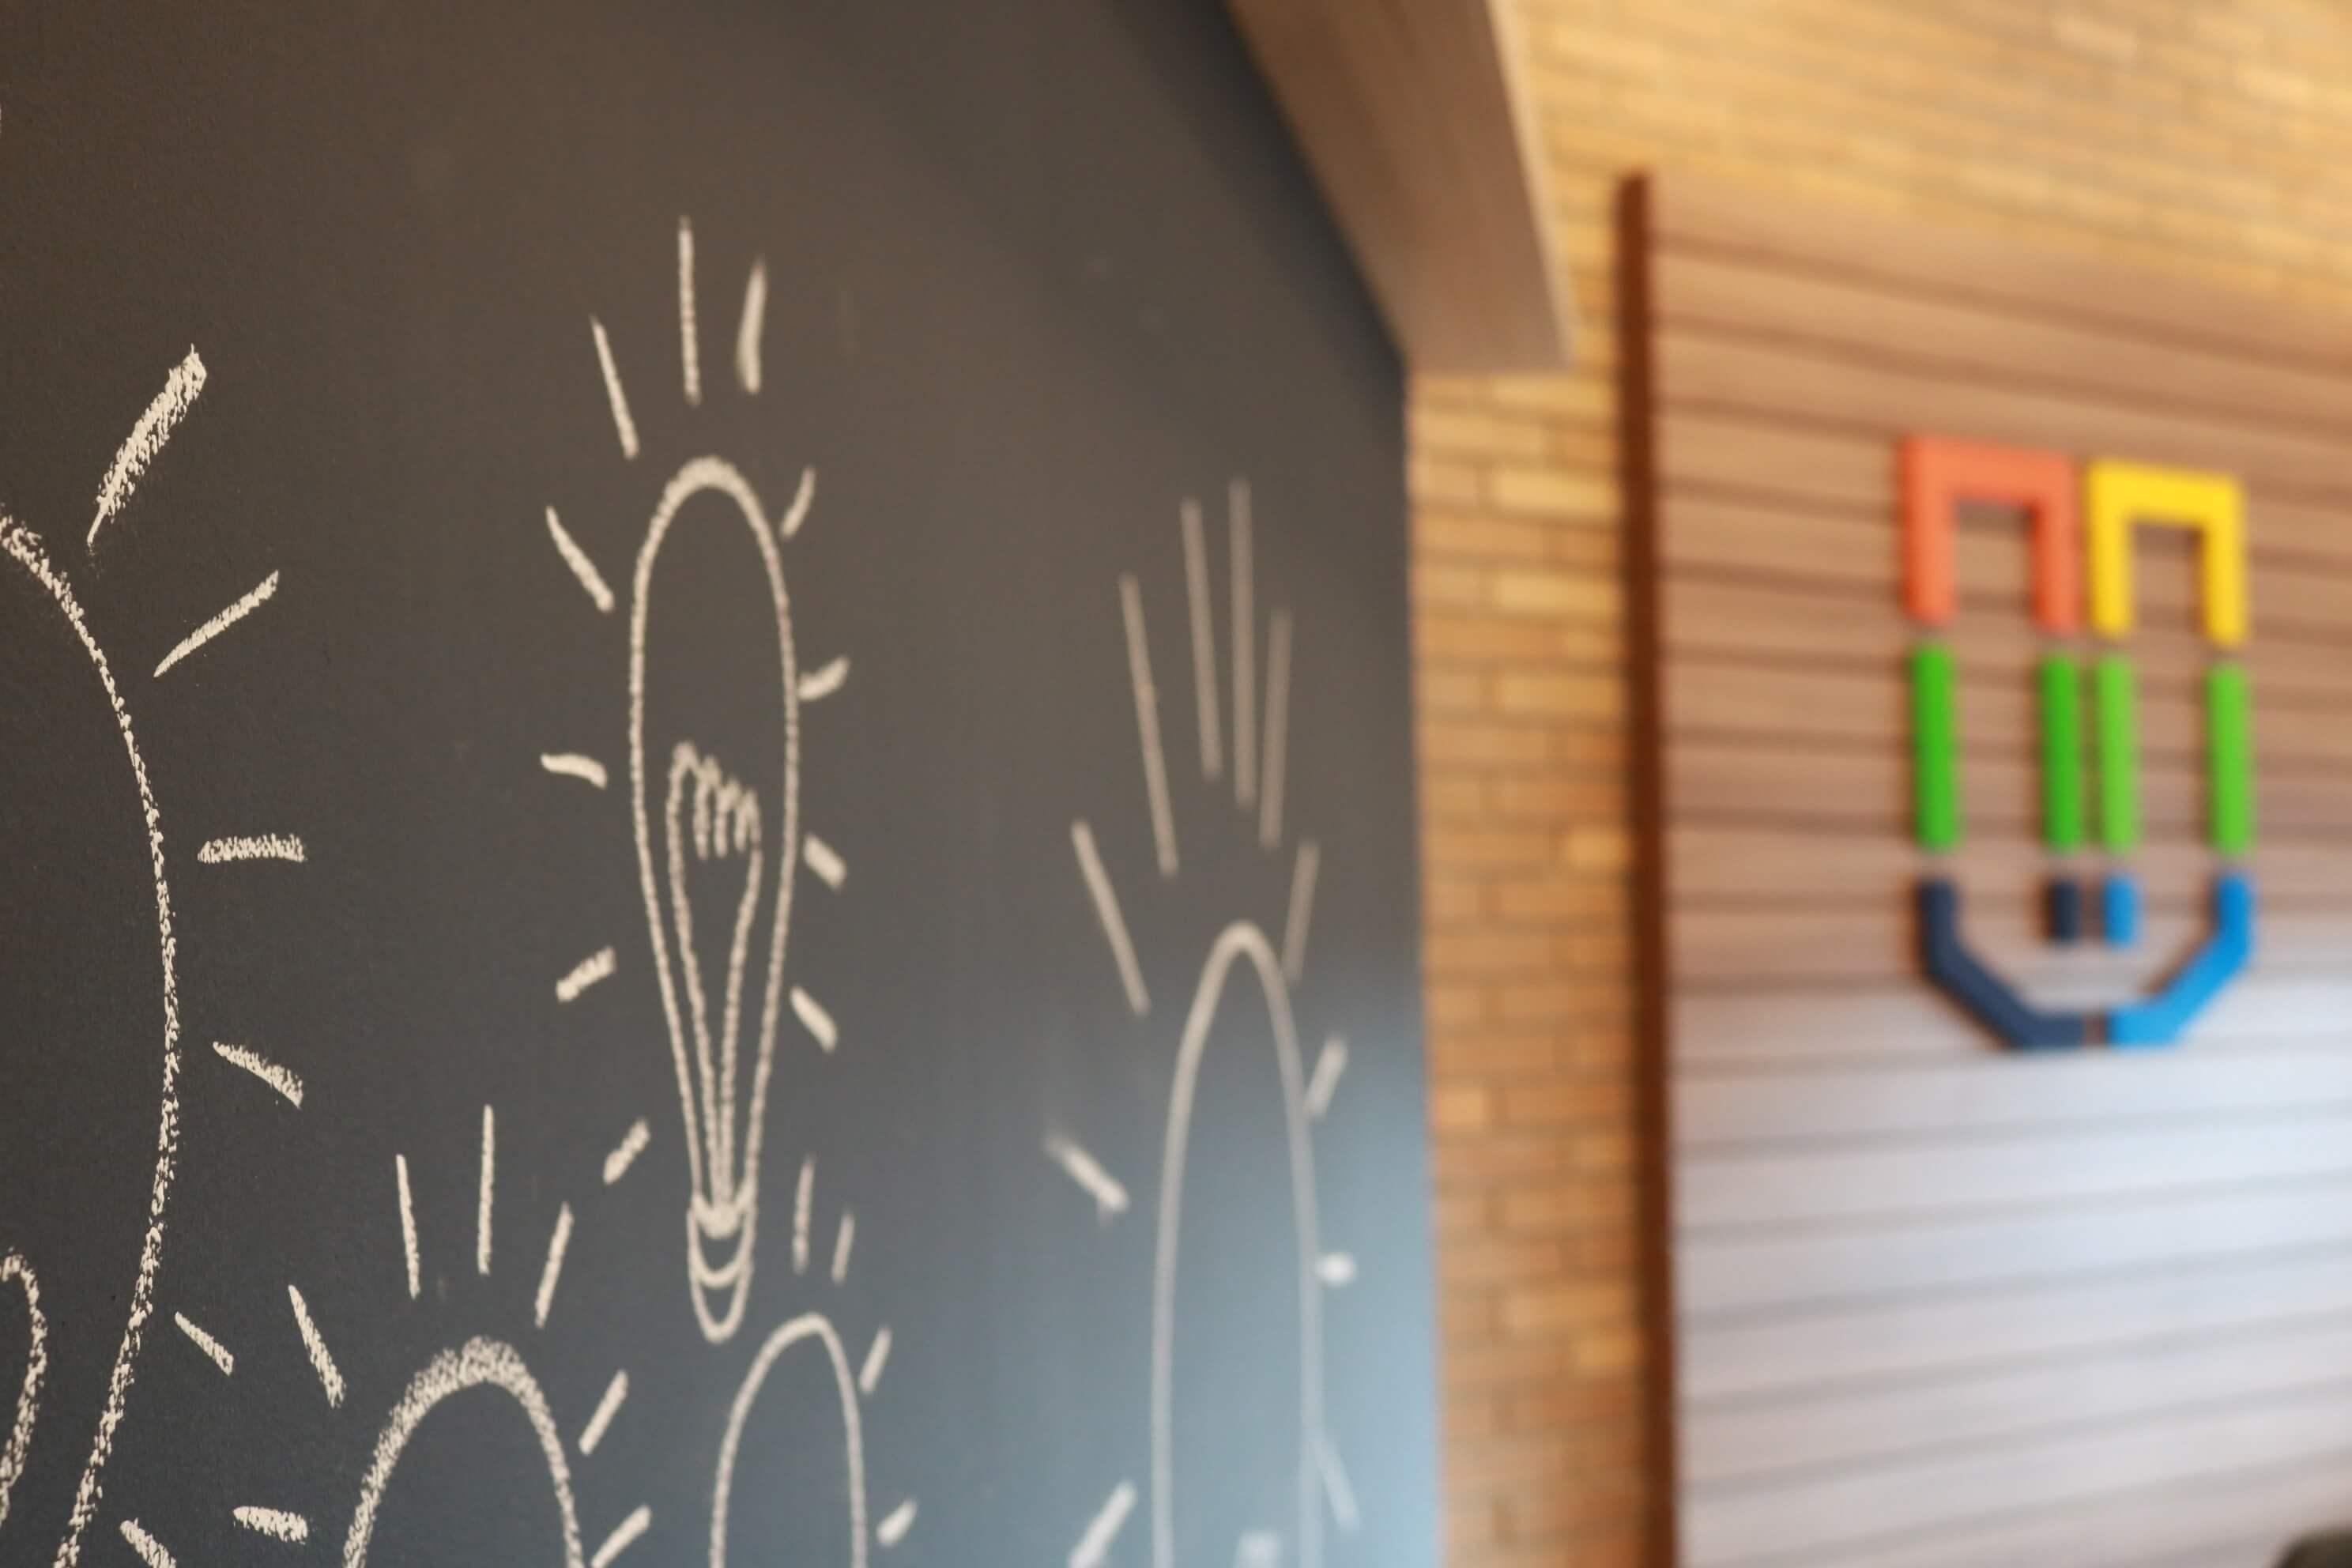 Mercado-trabalho-estudantes-UCPel-parede-lâmpadas-desenhadas-giz-logo-UCPel-desfocado-fundo